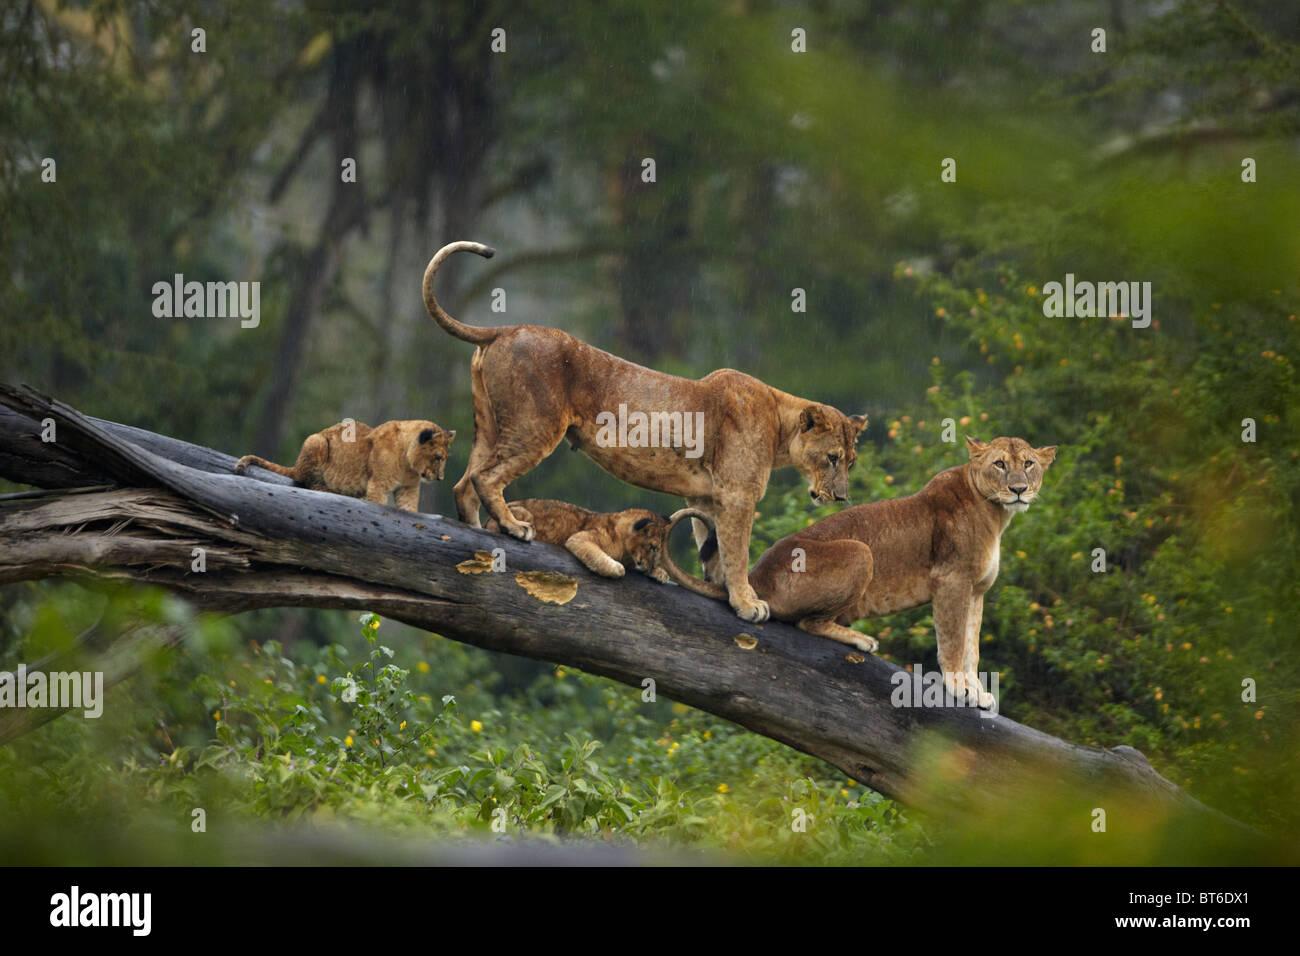 Lions sitting on a fallen tree trunk in Lake Nakuru, Kenya Stock Photo